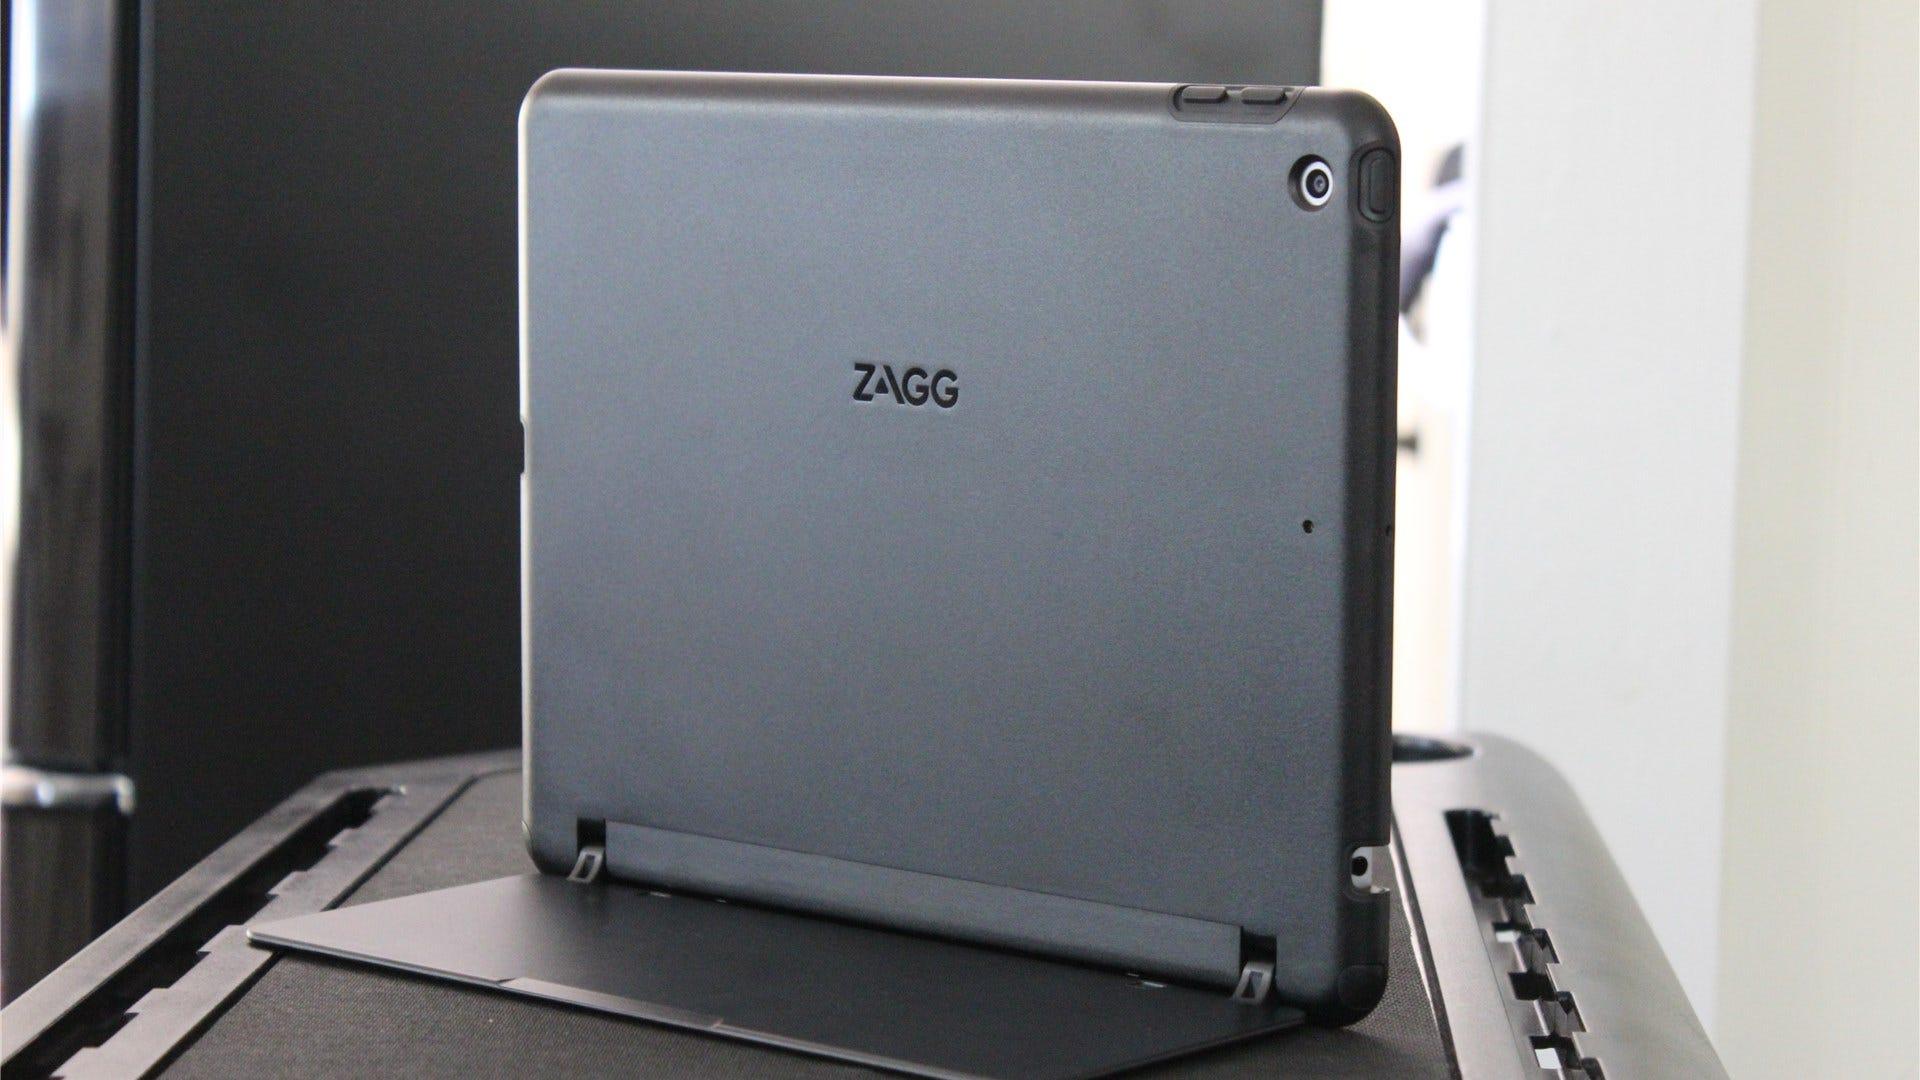 Zagg Slim Book Go from the back